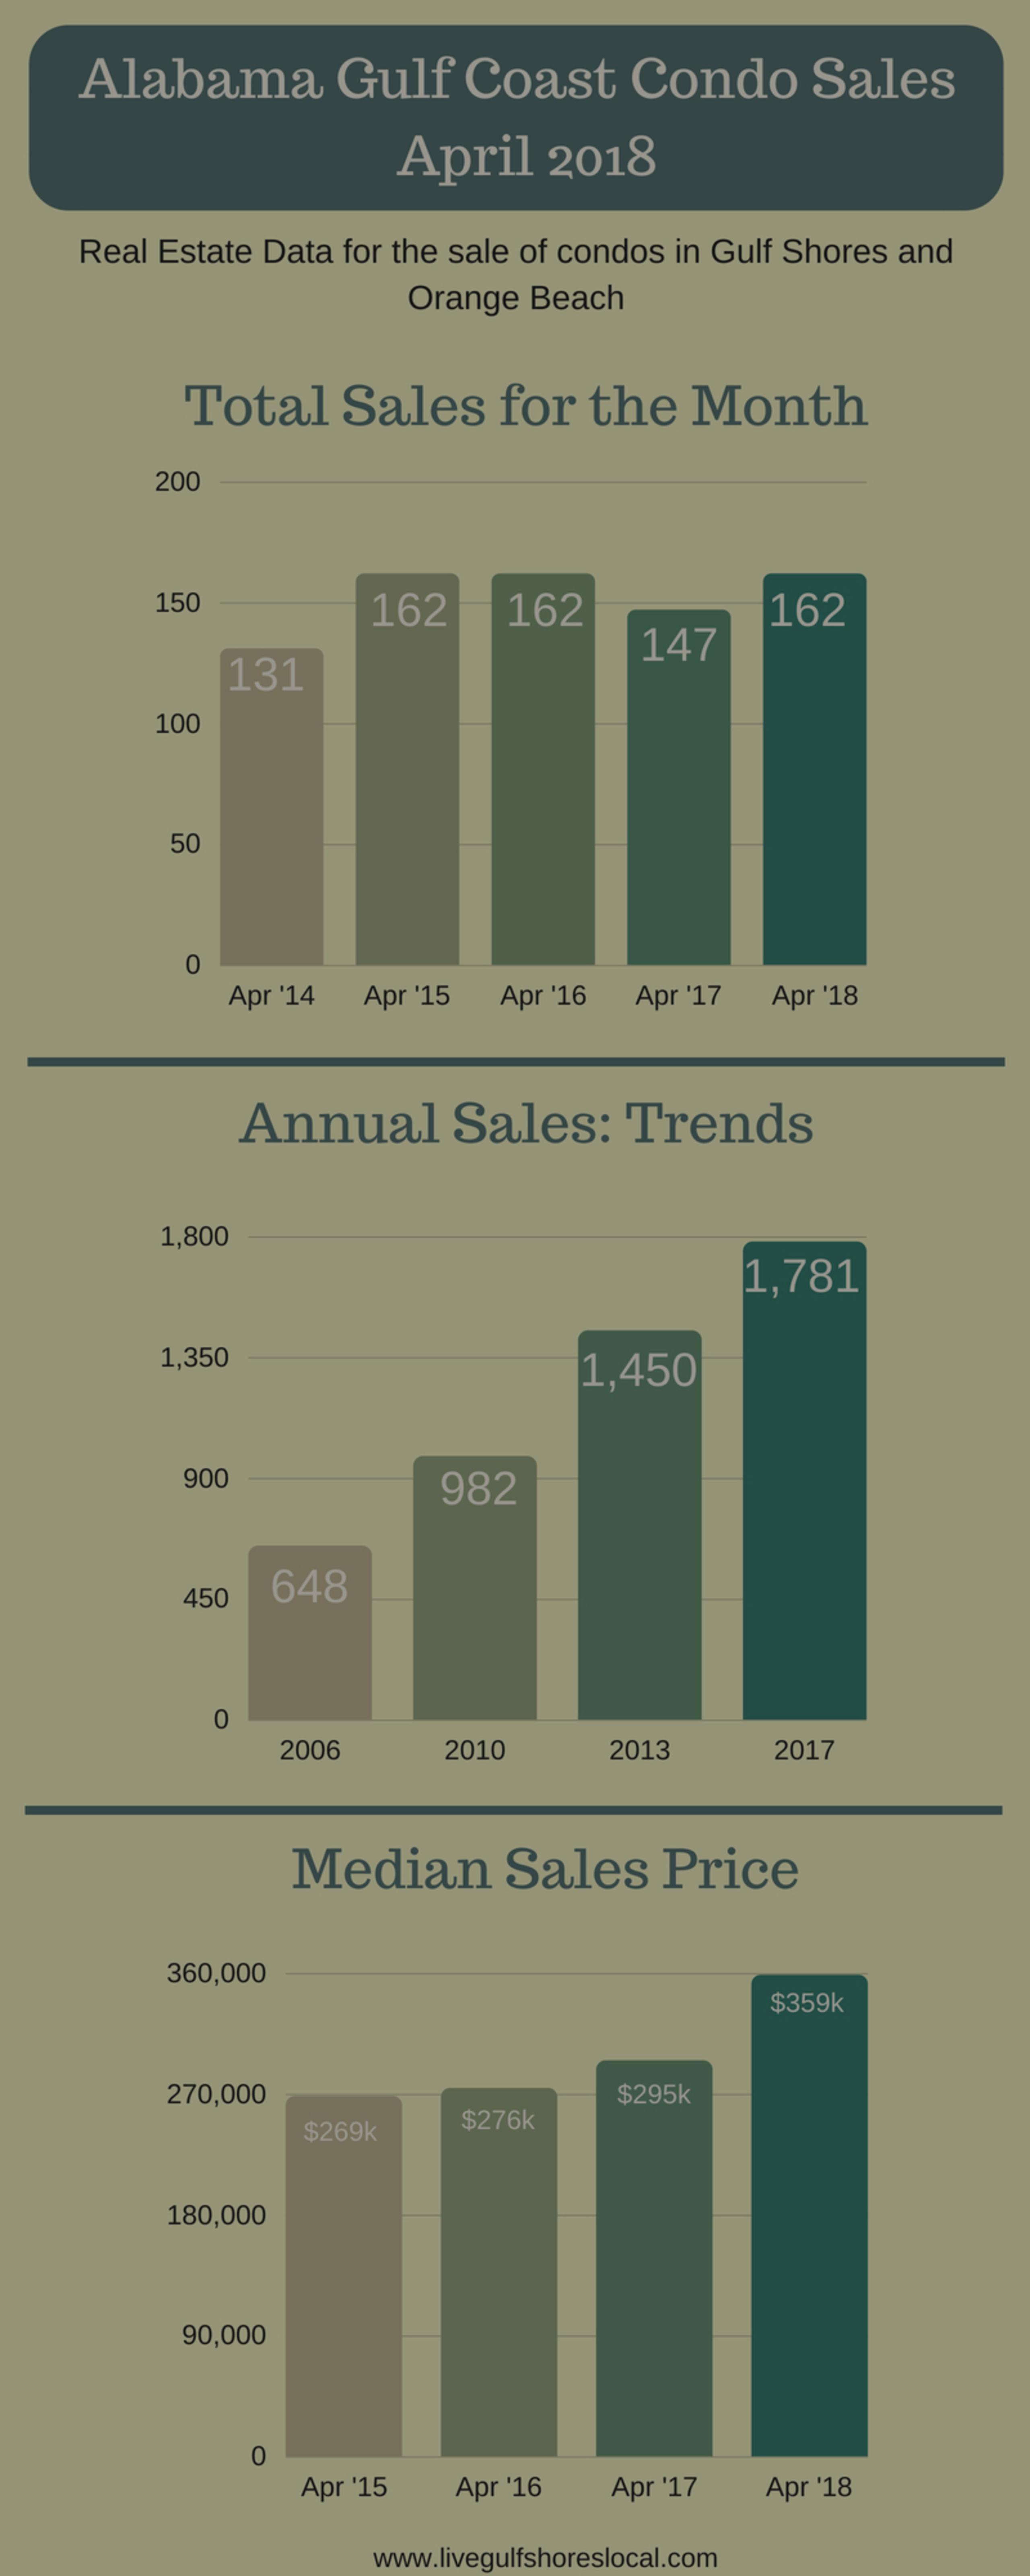 Alabama Gulf Coast Condo Sales – April 2018